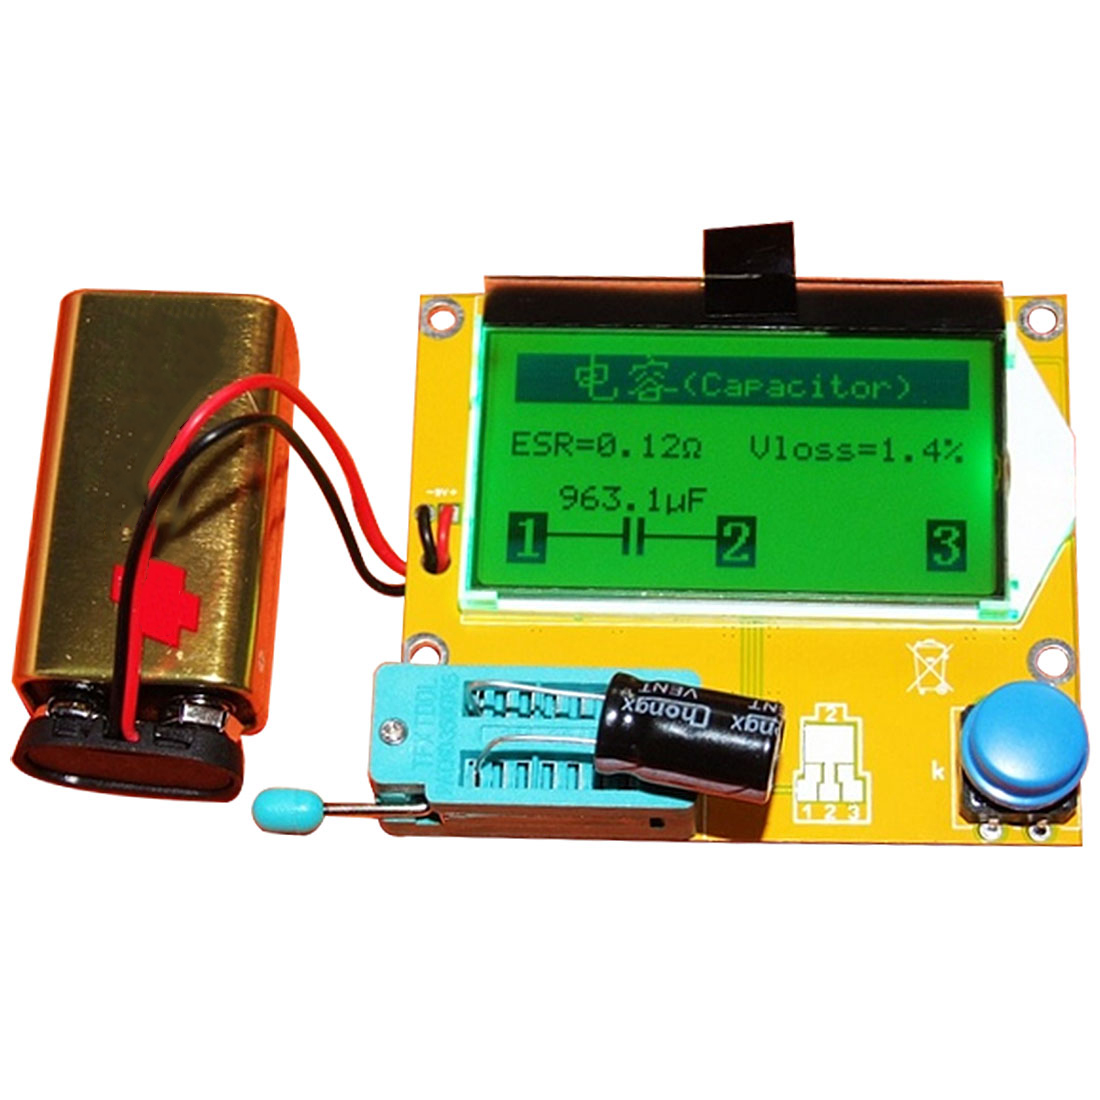 Digitale LCR M328 V2.68 ESR-T4 Diode Triodo Capacità di MOS/PNP/NPN LCR 12864 Tester Schermo LCD per ESR meter di Prova Transistor